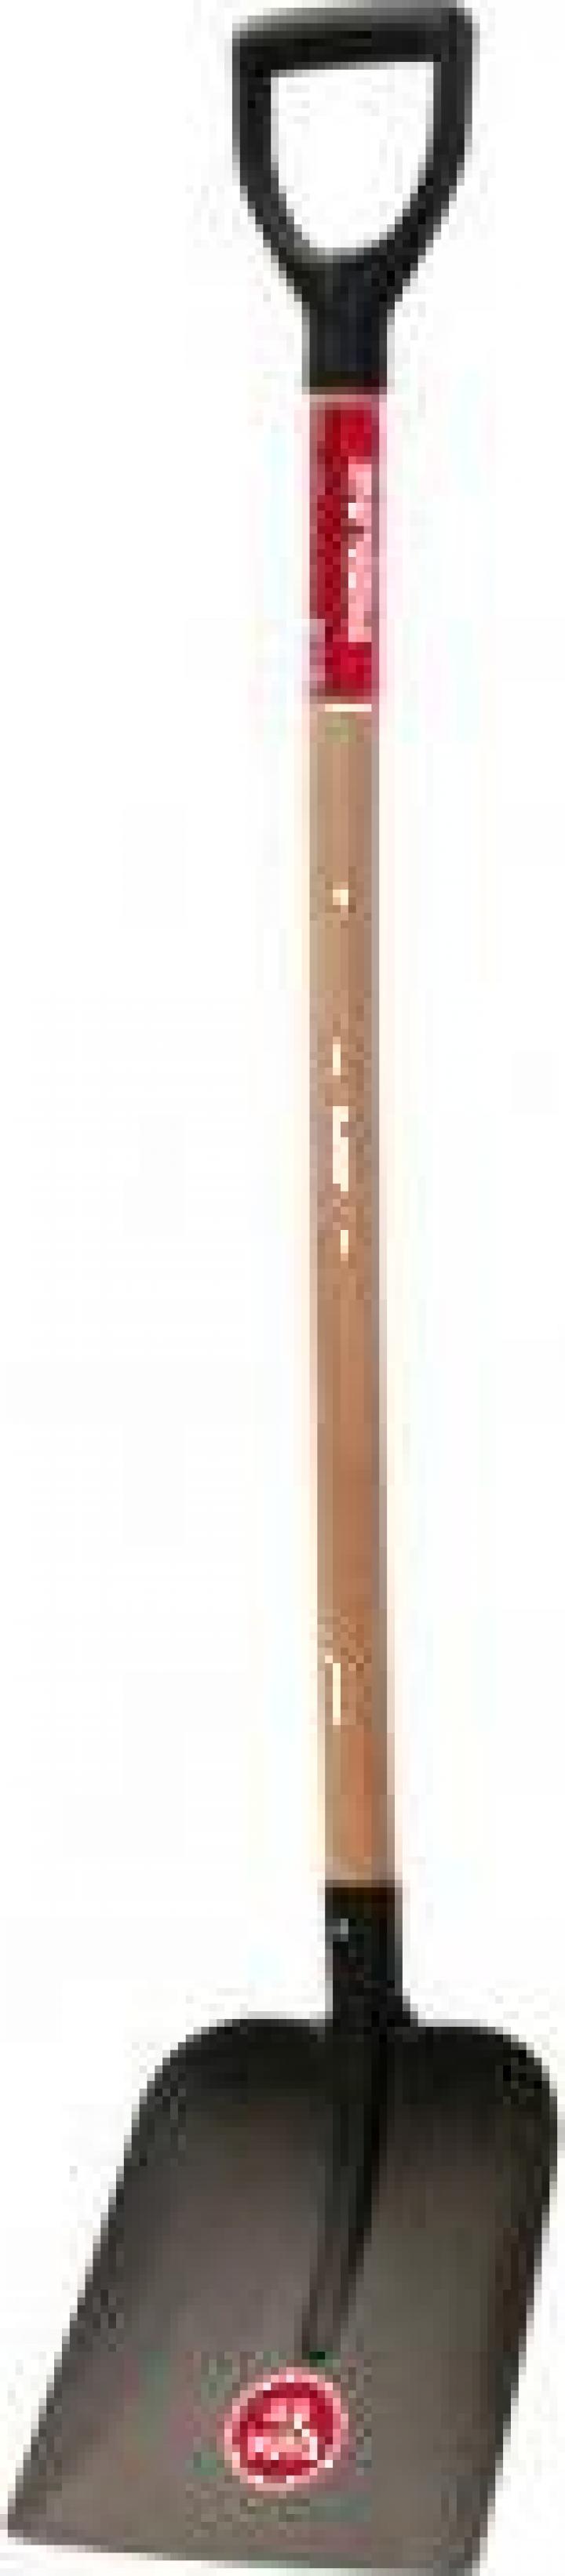 Lopata cu maner lemn 250x280/1250mm